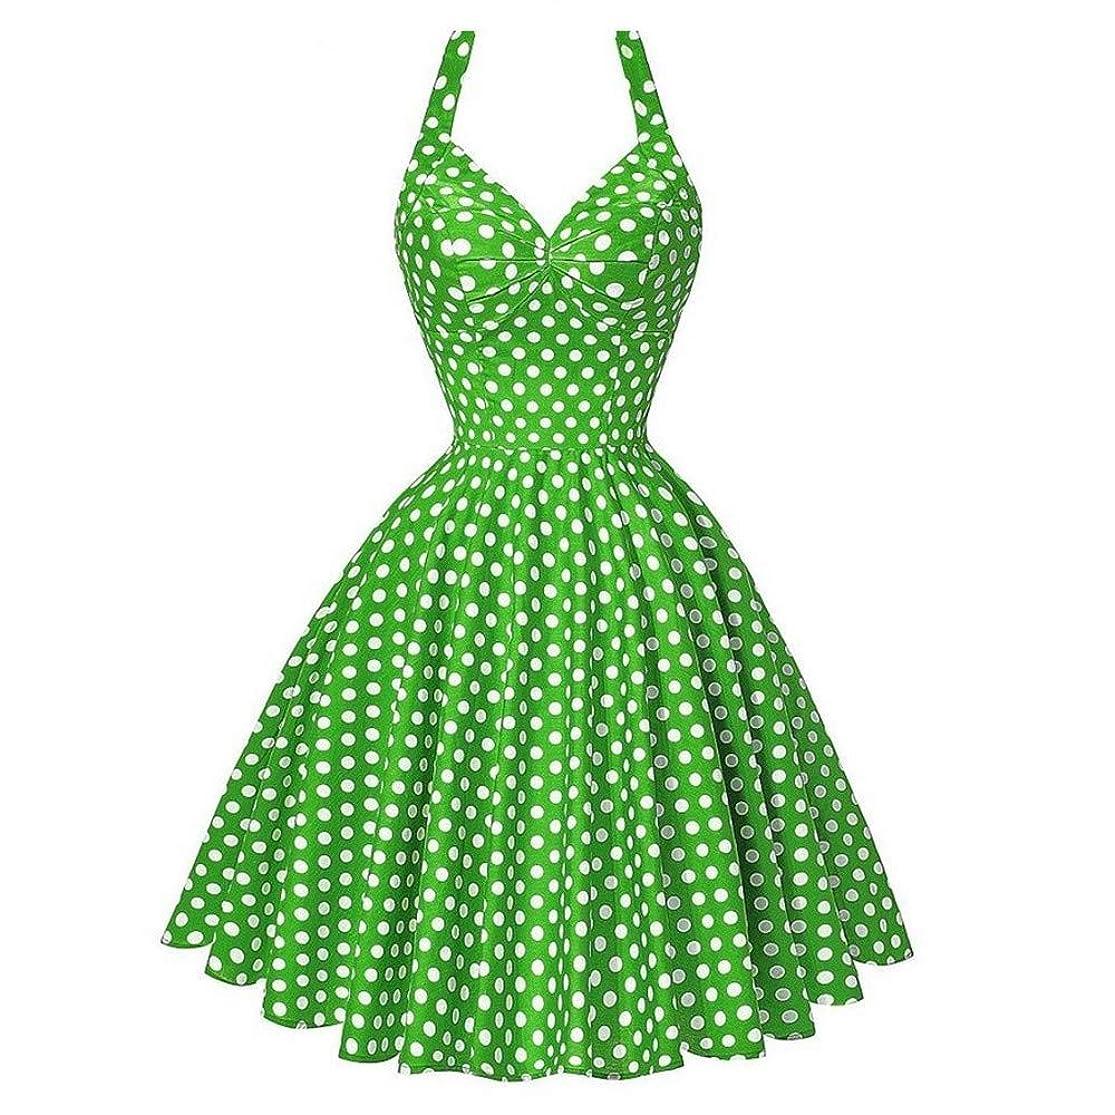 iLUGU Halter Collar Sleeveless Knee-Length Dress For Women Dot Print Waist A-Line Summer Dresses For Women uynmhxda5